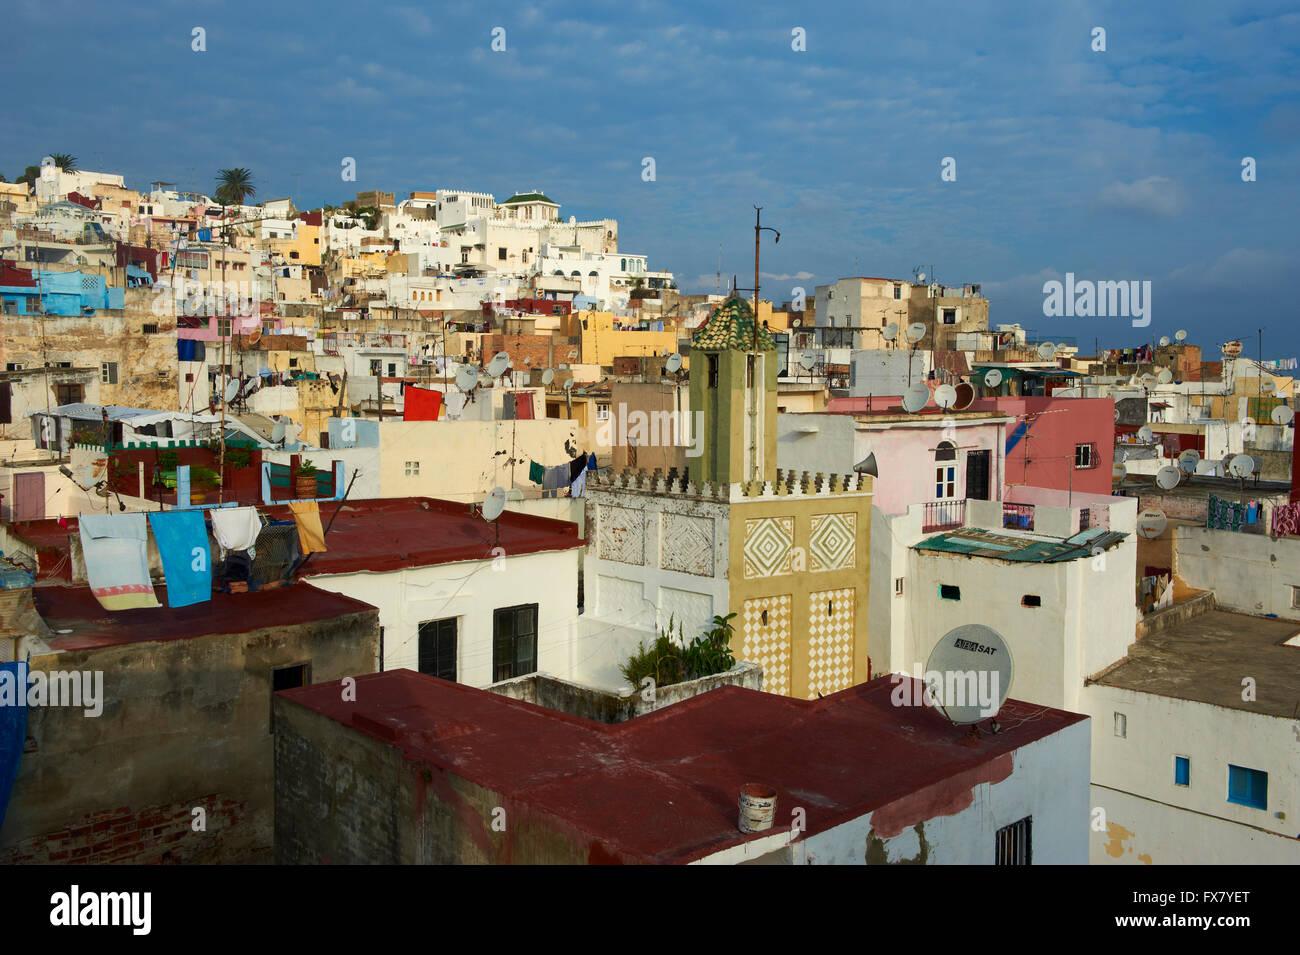 Marruecos, Tánger, Medina, ciudad vieja Imagen De Stock